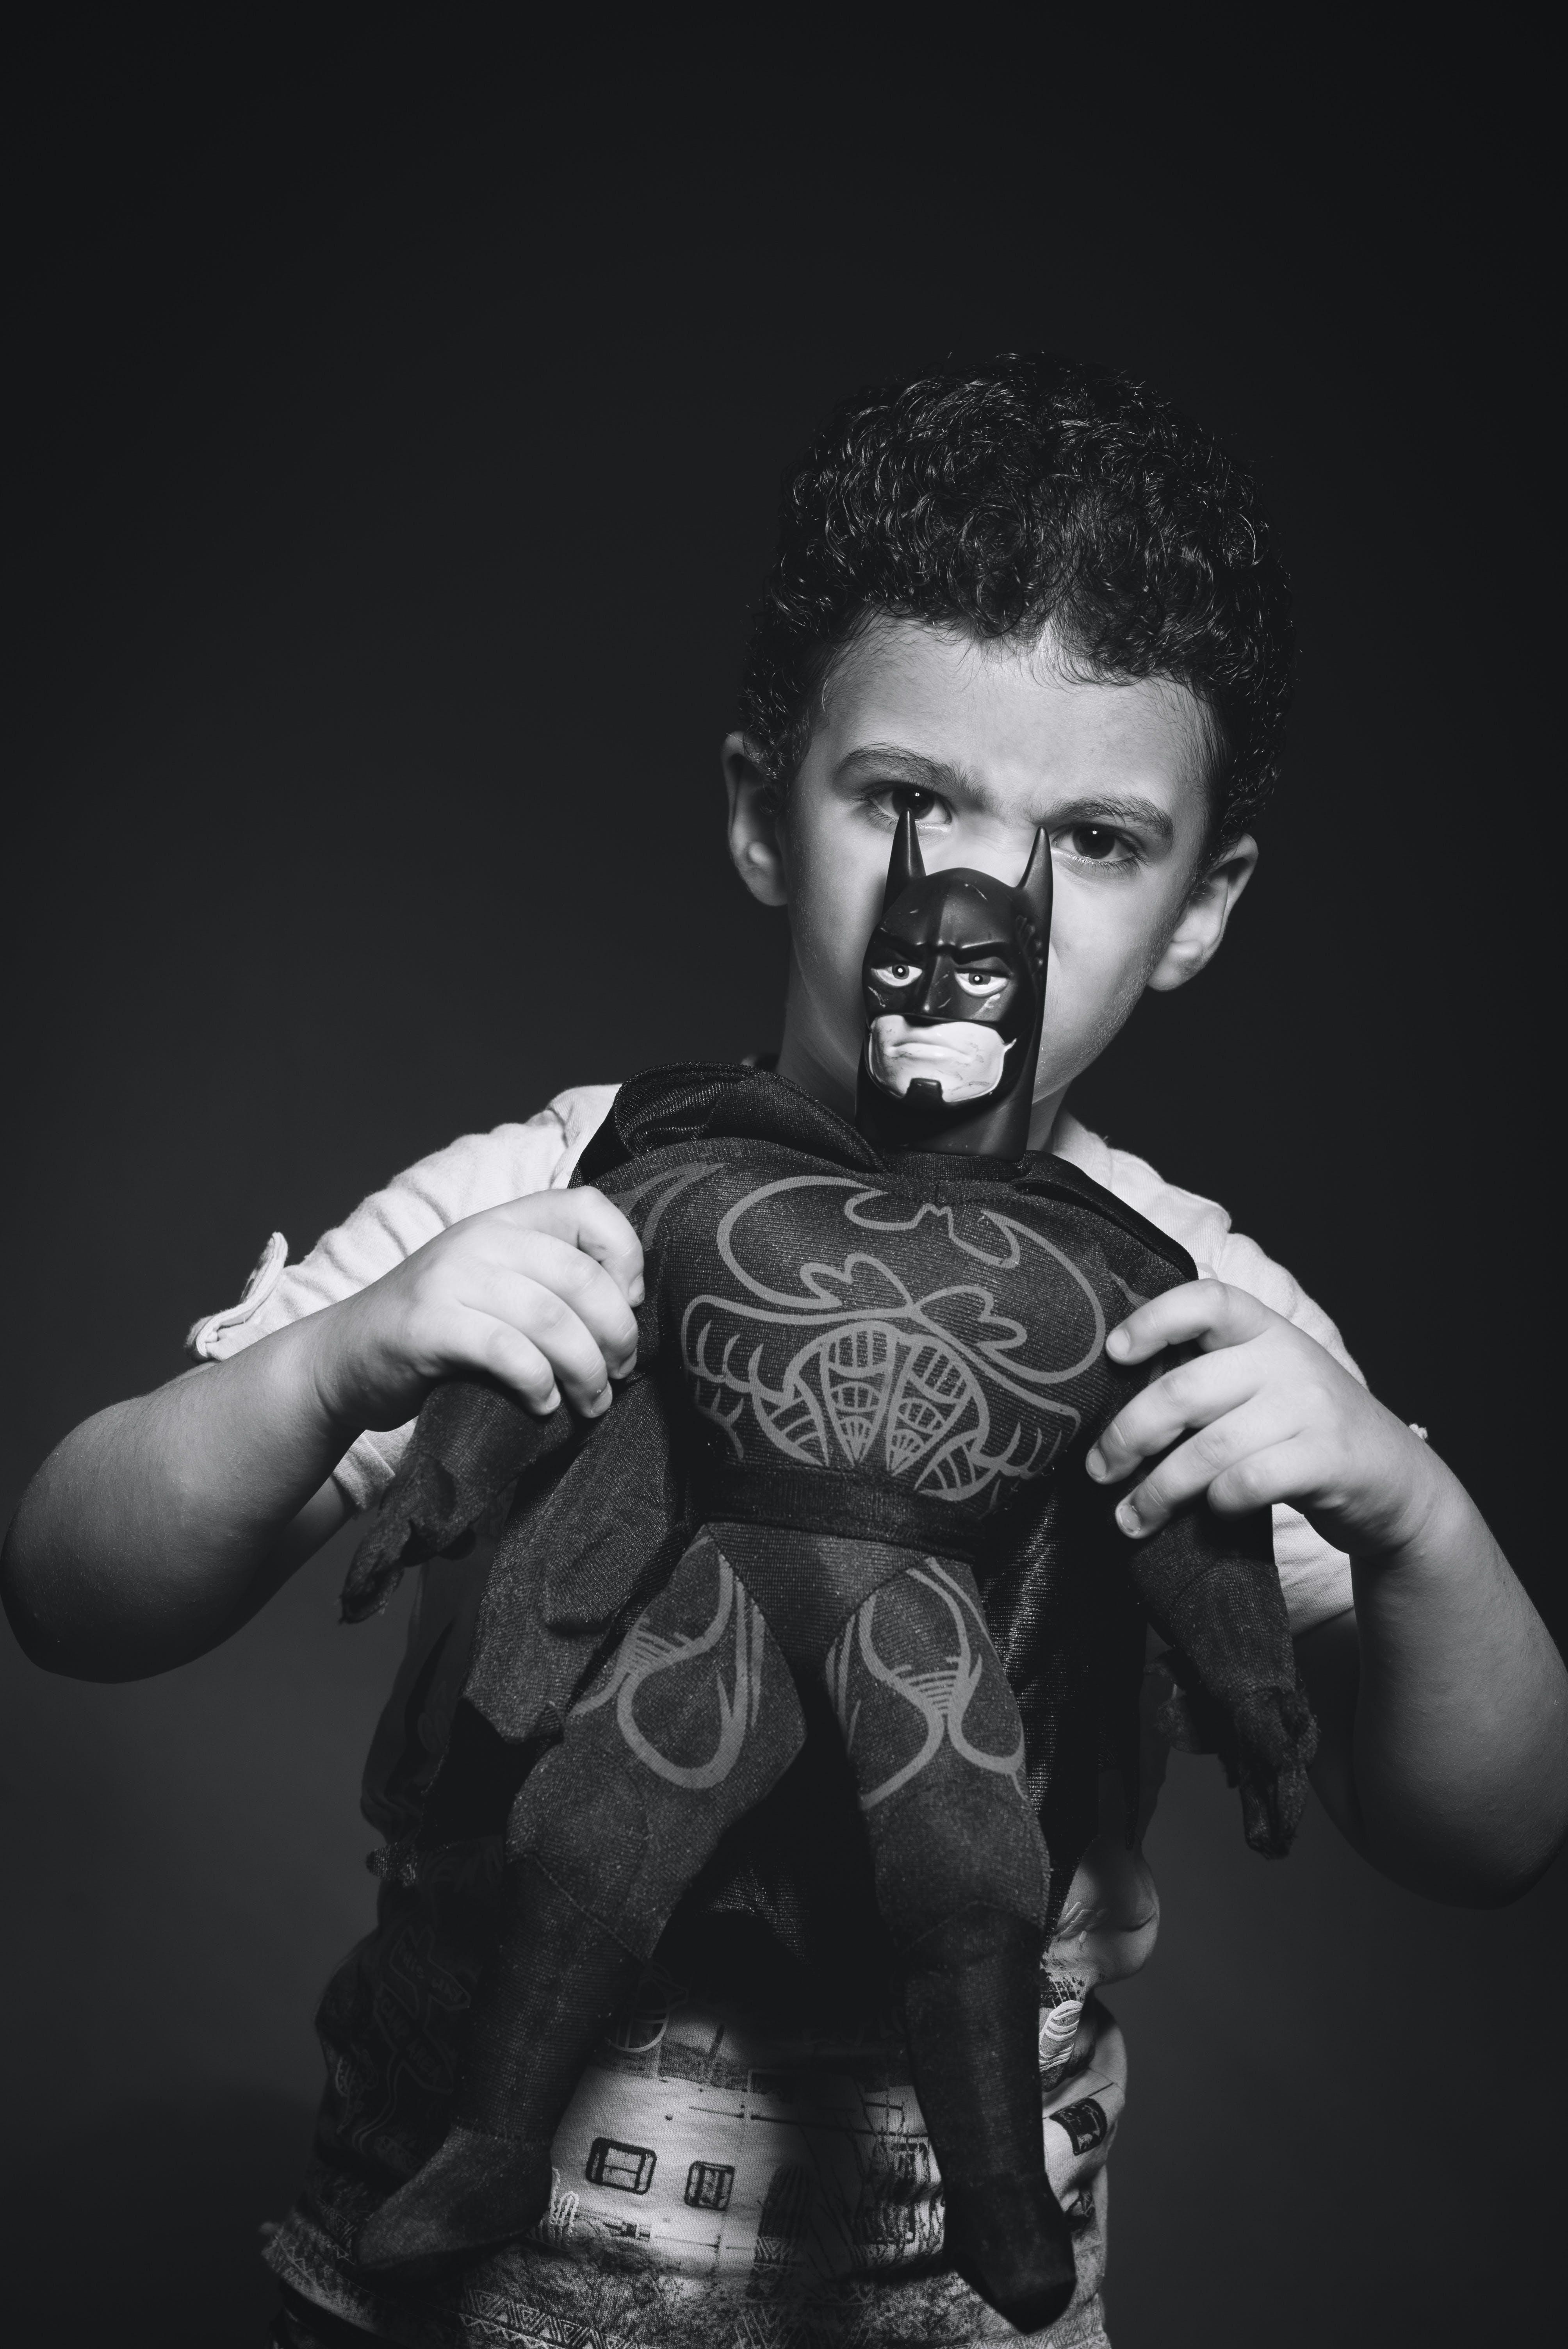 Grayscale Photo of Boy Holding Batman Plush Toy